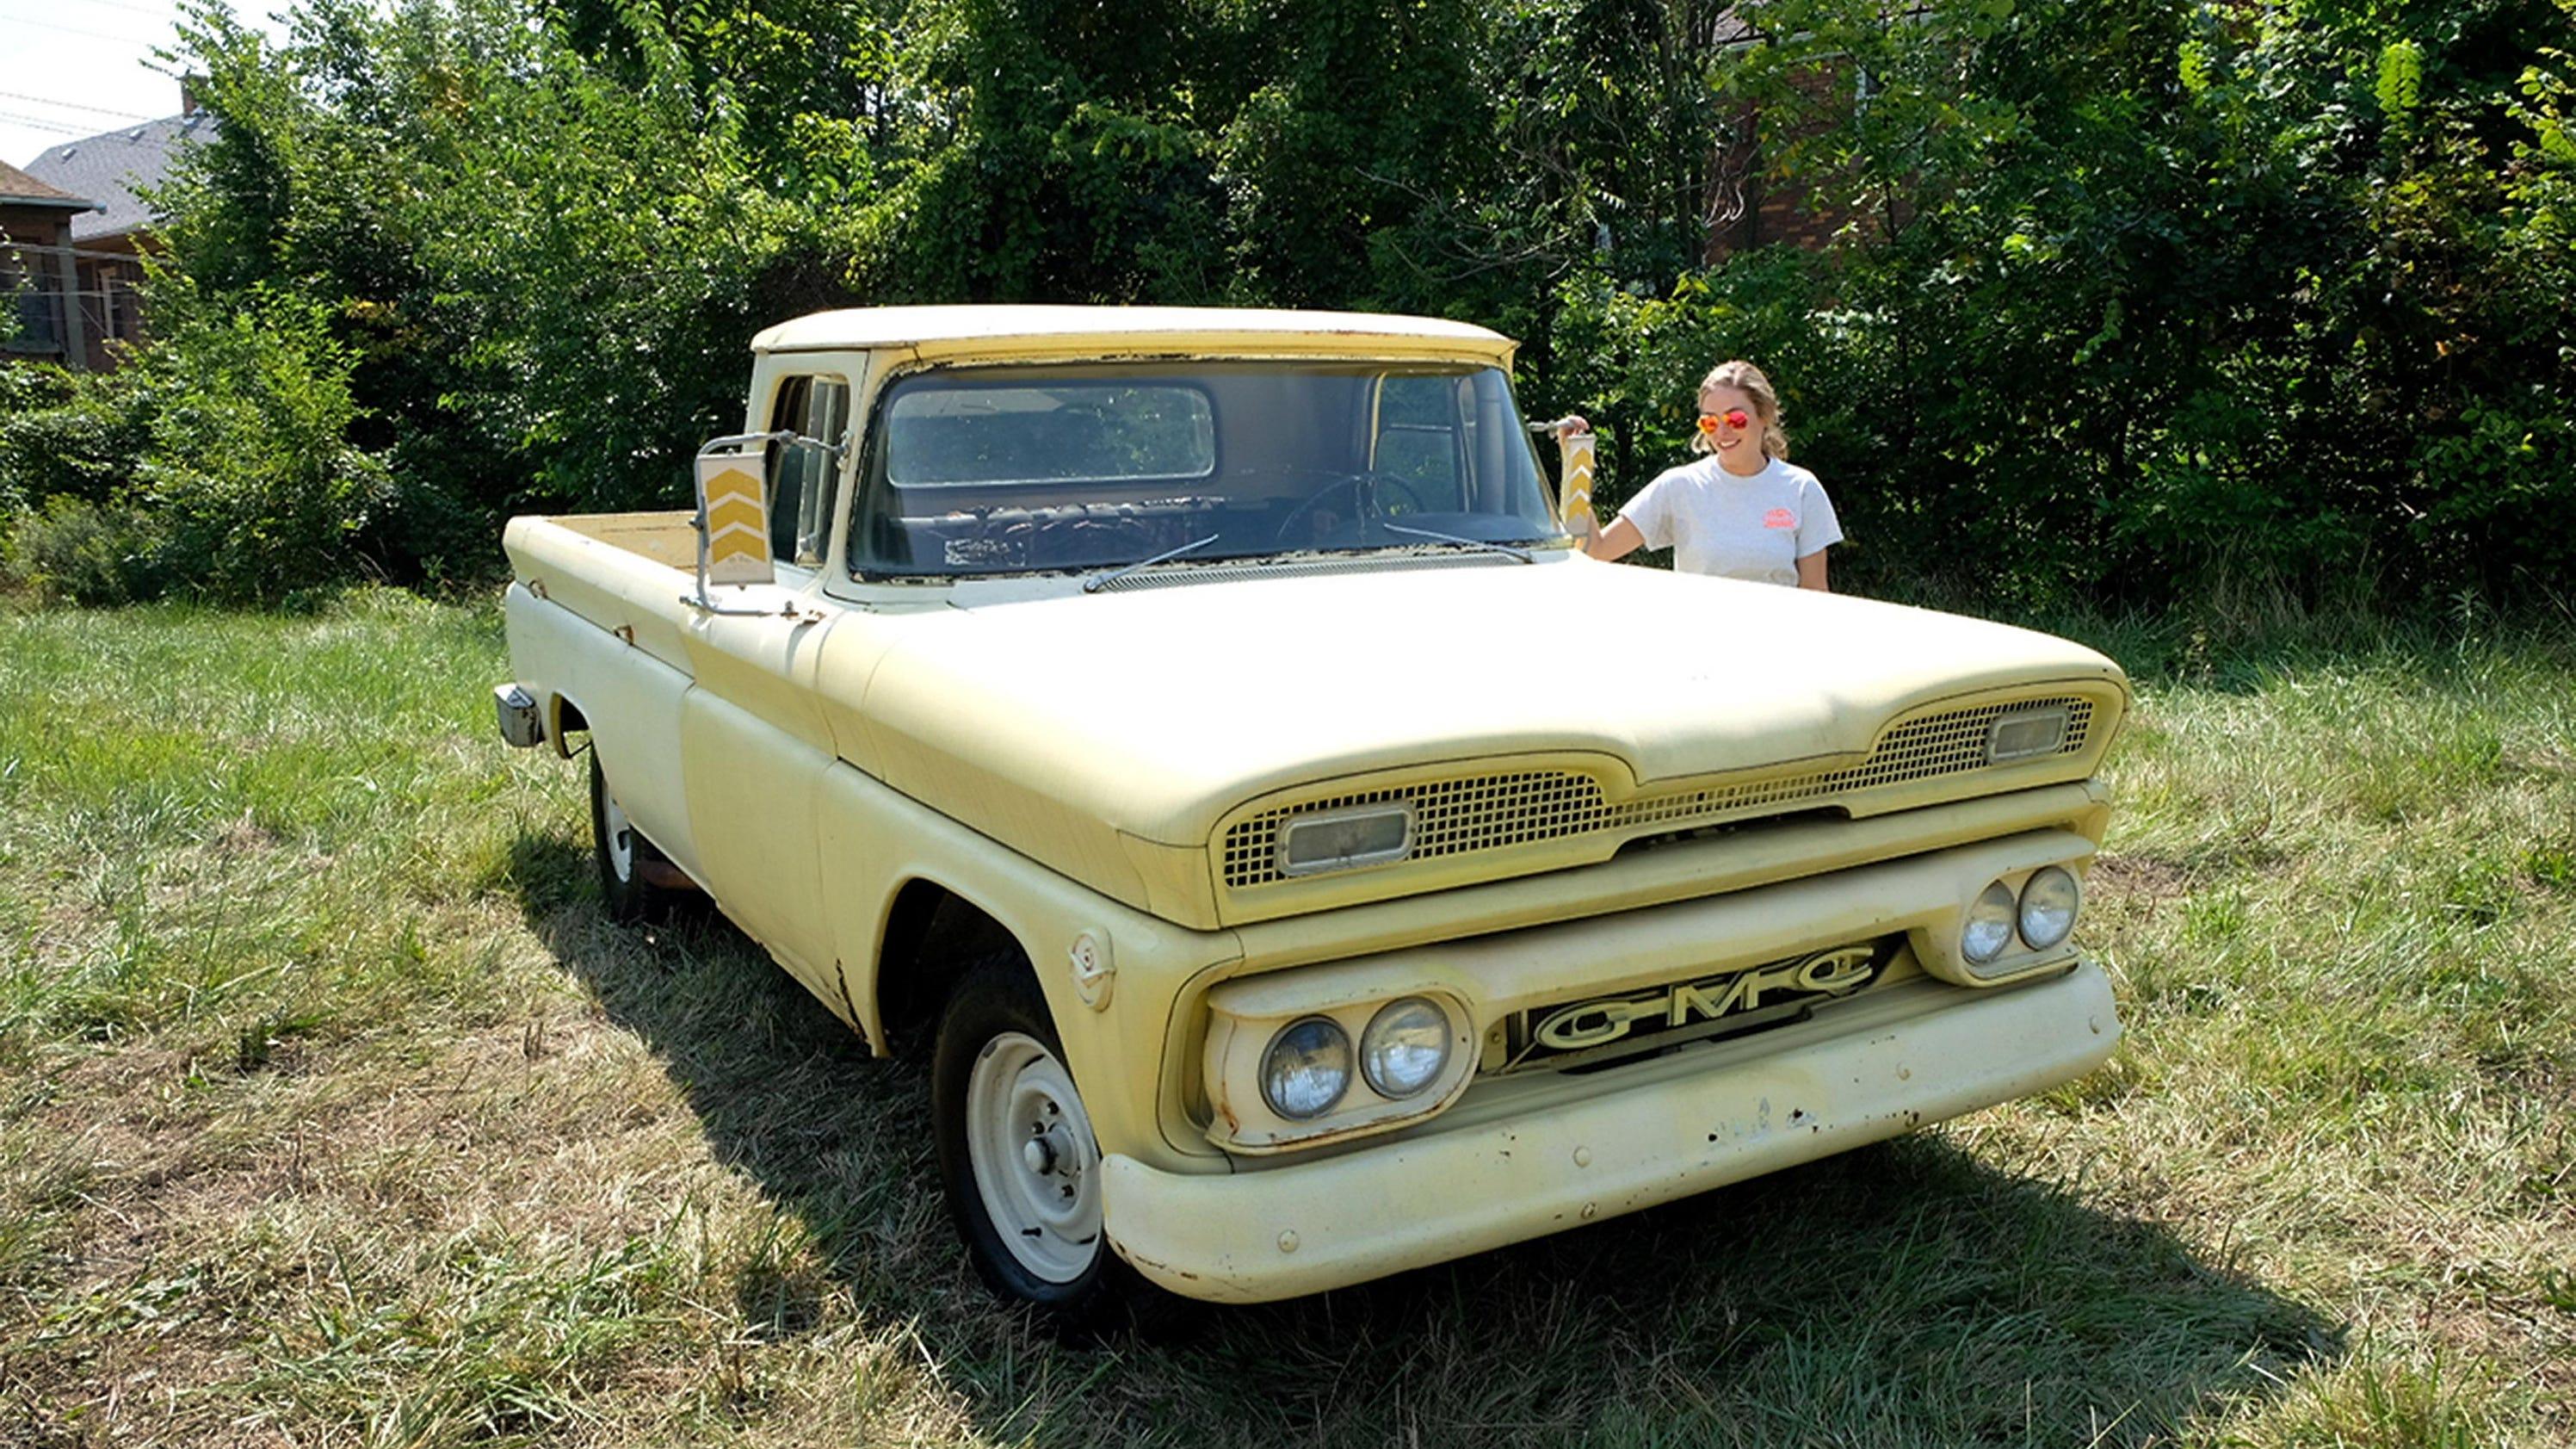 The Woodward Dream Cruise, classic car cruising - The Detroit News